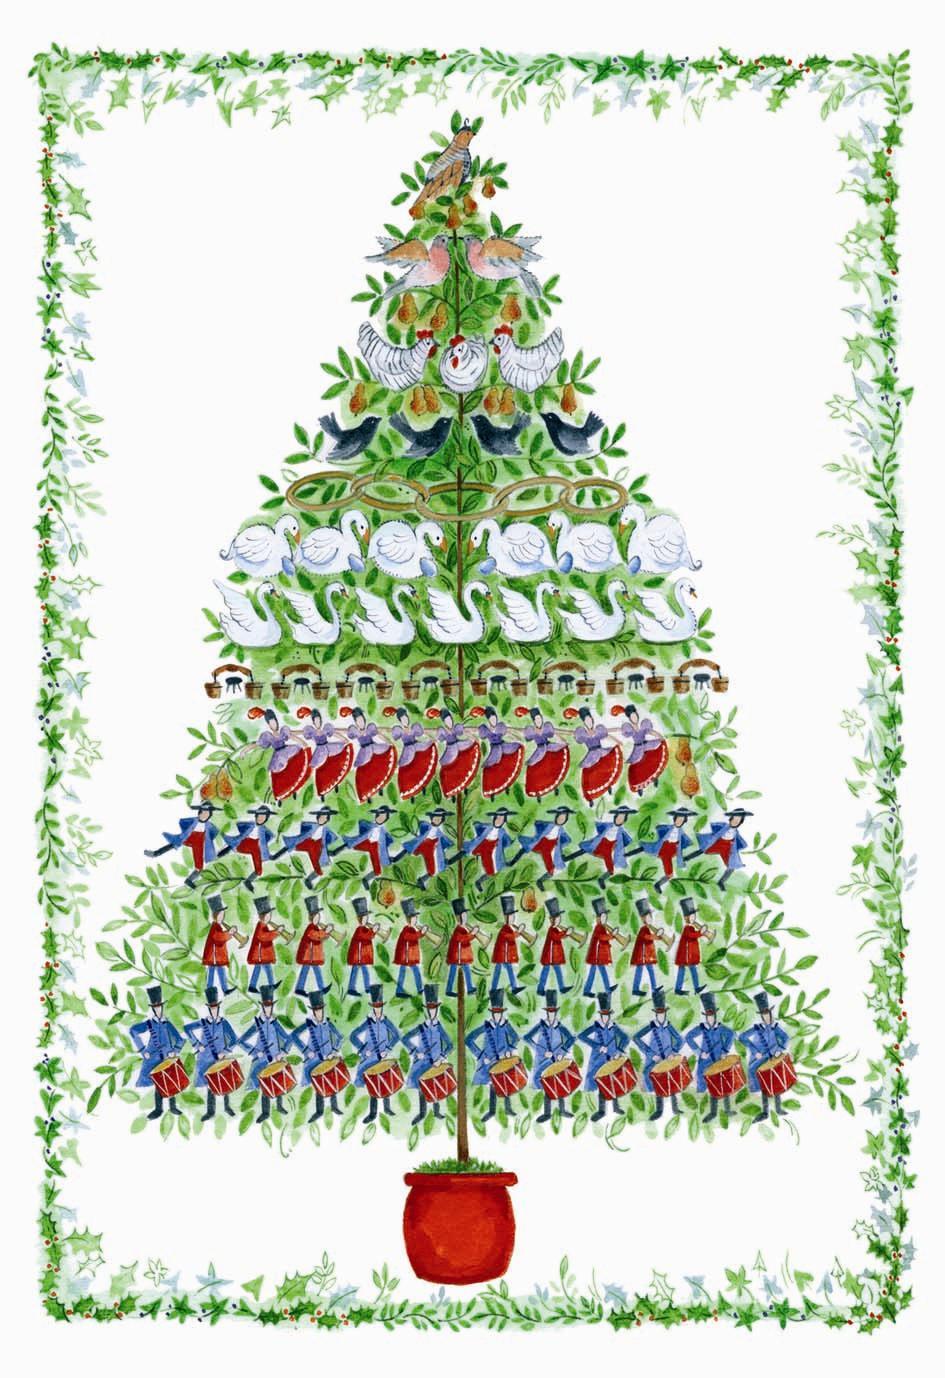 free 12 days of christmas lapbook - 12 Days Of Christmas Christian Version